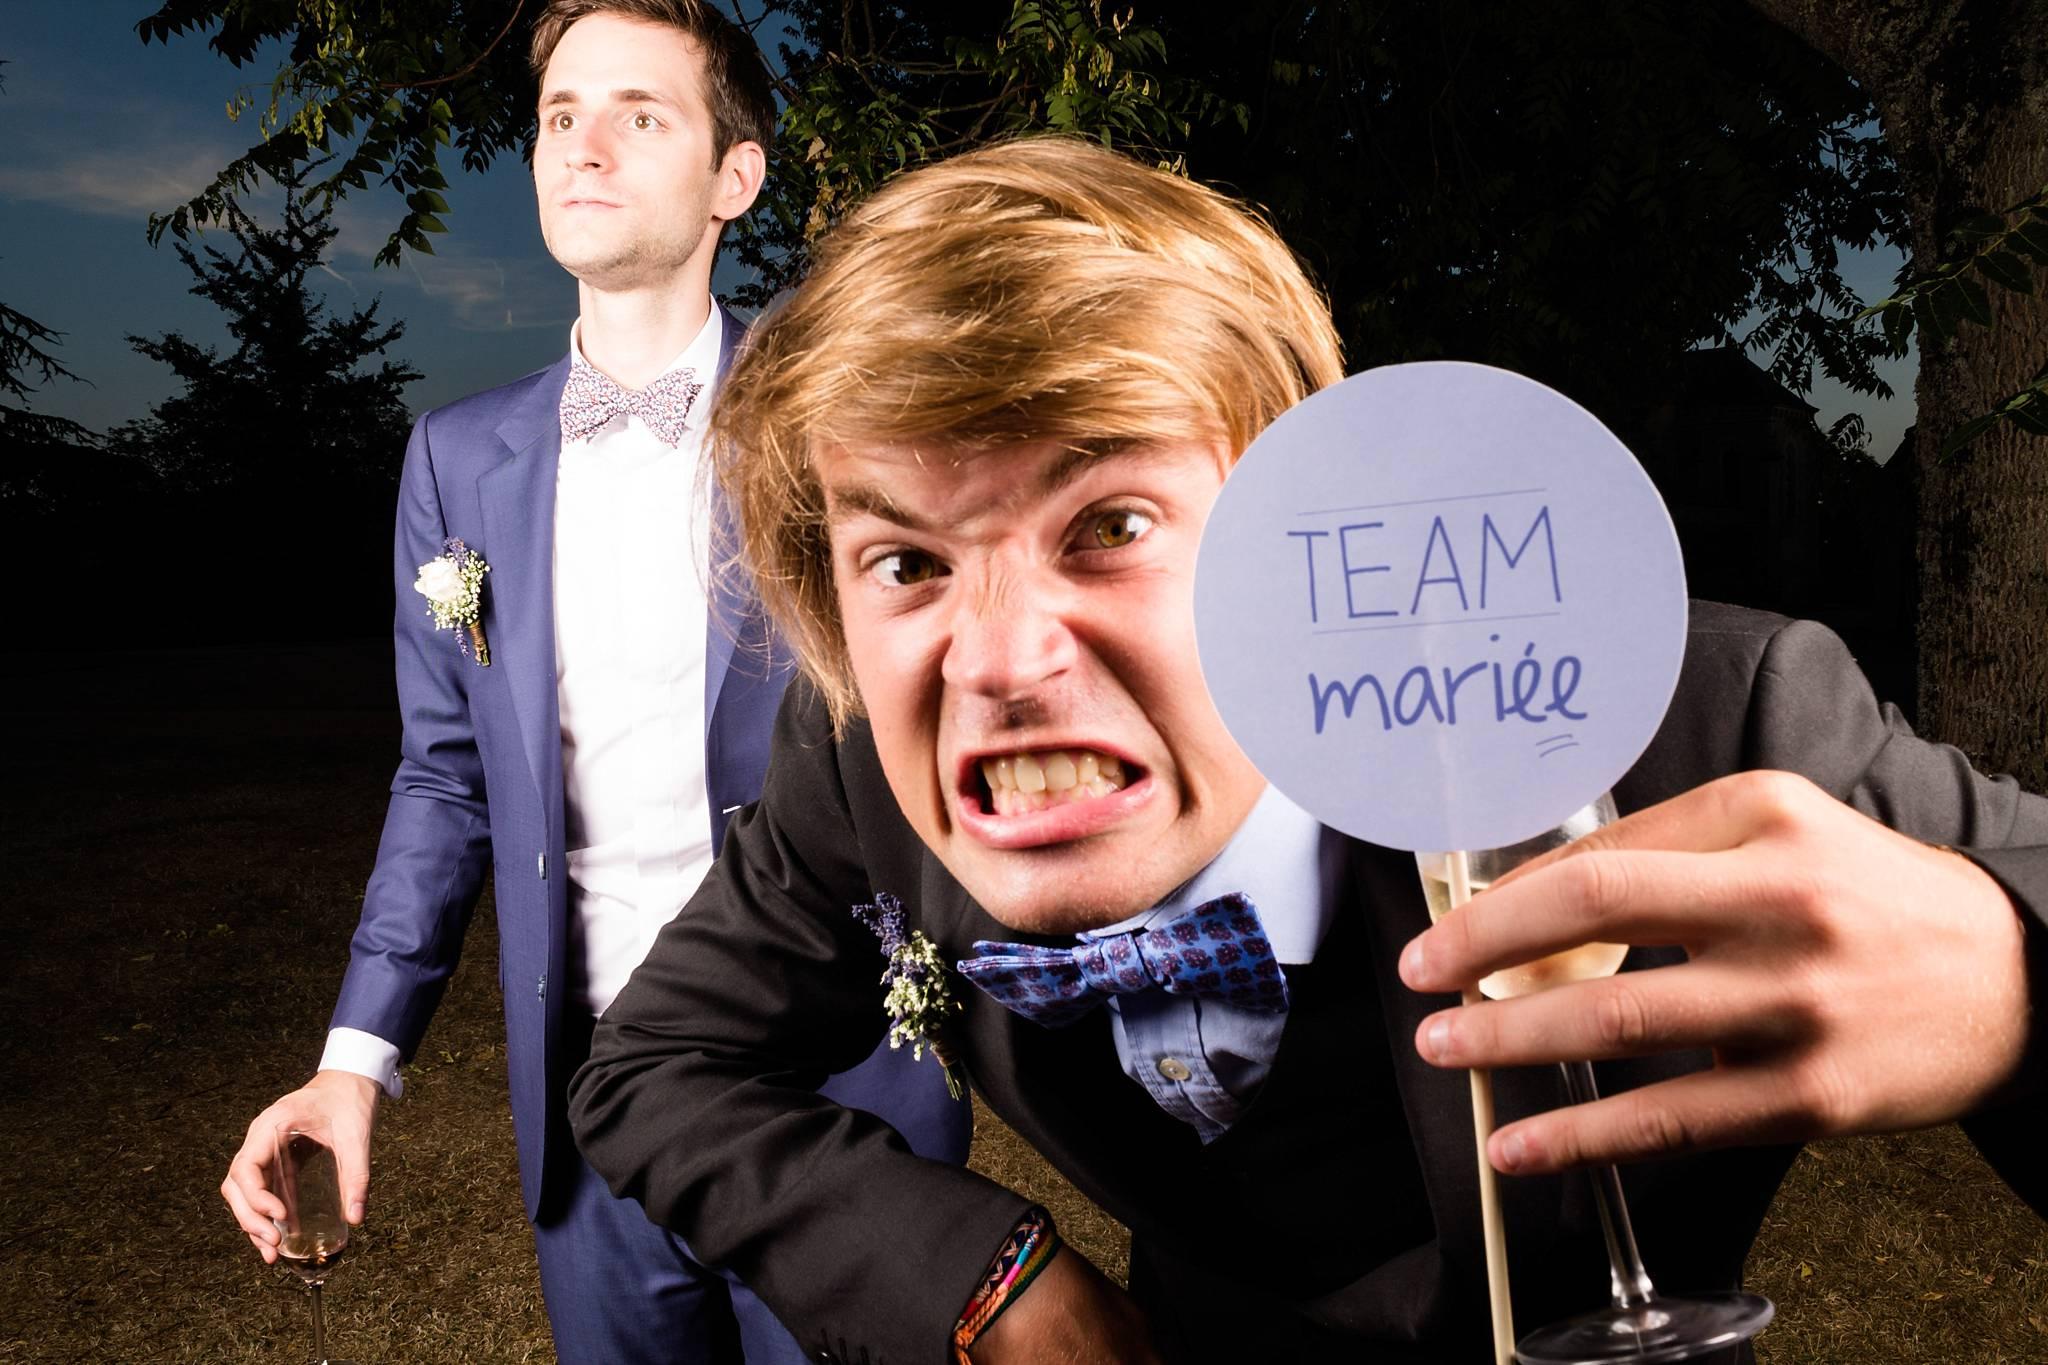 14_photobooth-mariage-bordeaux-gironde-dordogne-charentes-alexandre-roschewitz-photographies_2048px